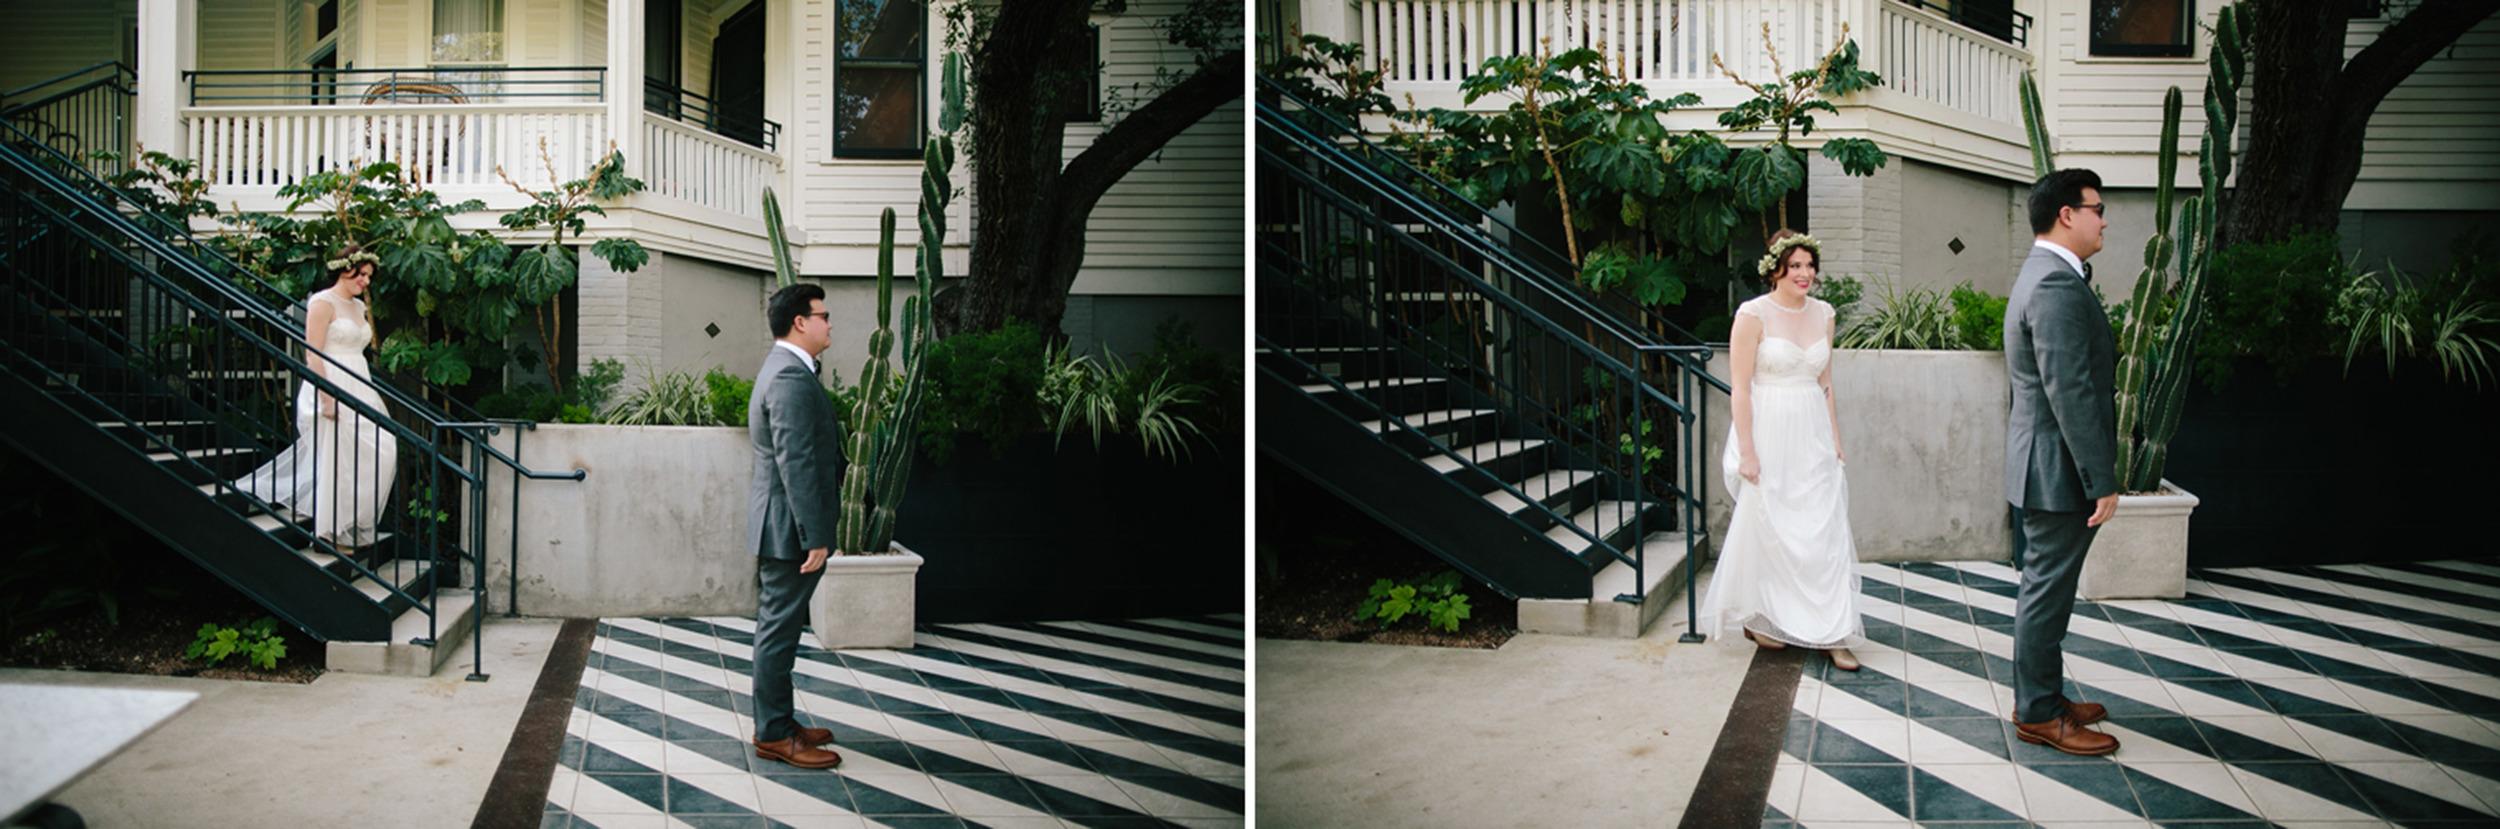 AustinWeddingPhotographer-Mercury-Hall012.jpg